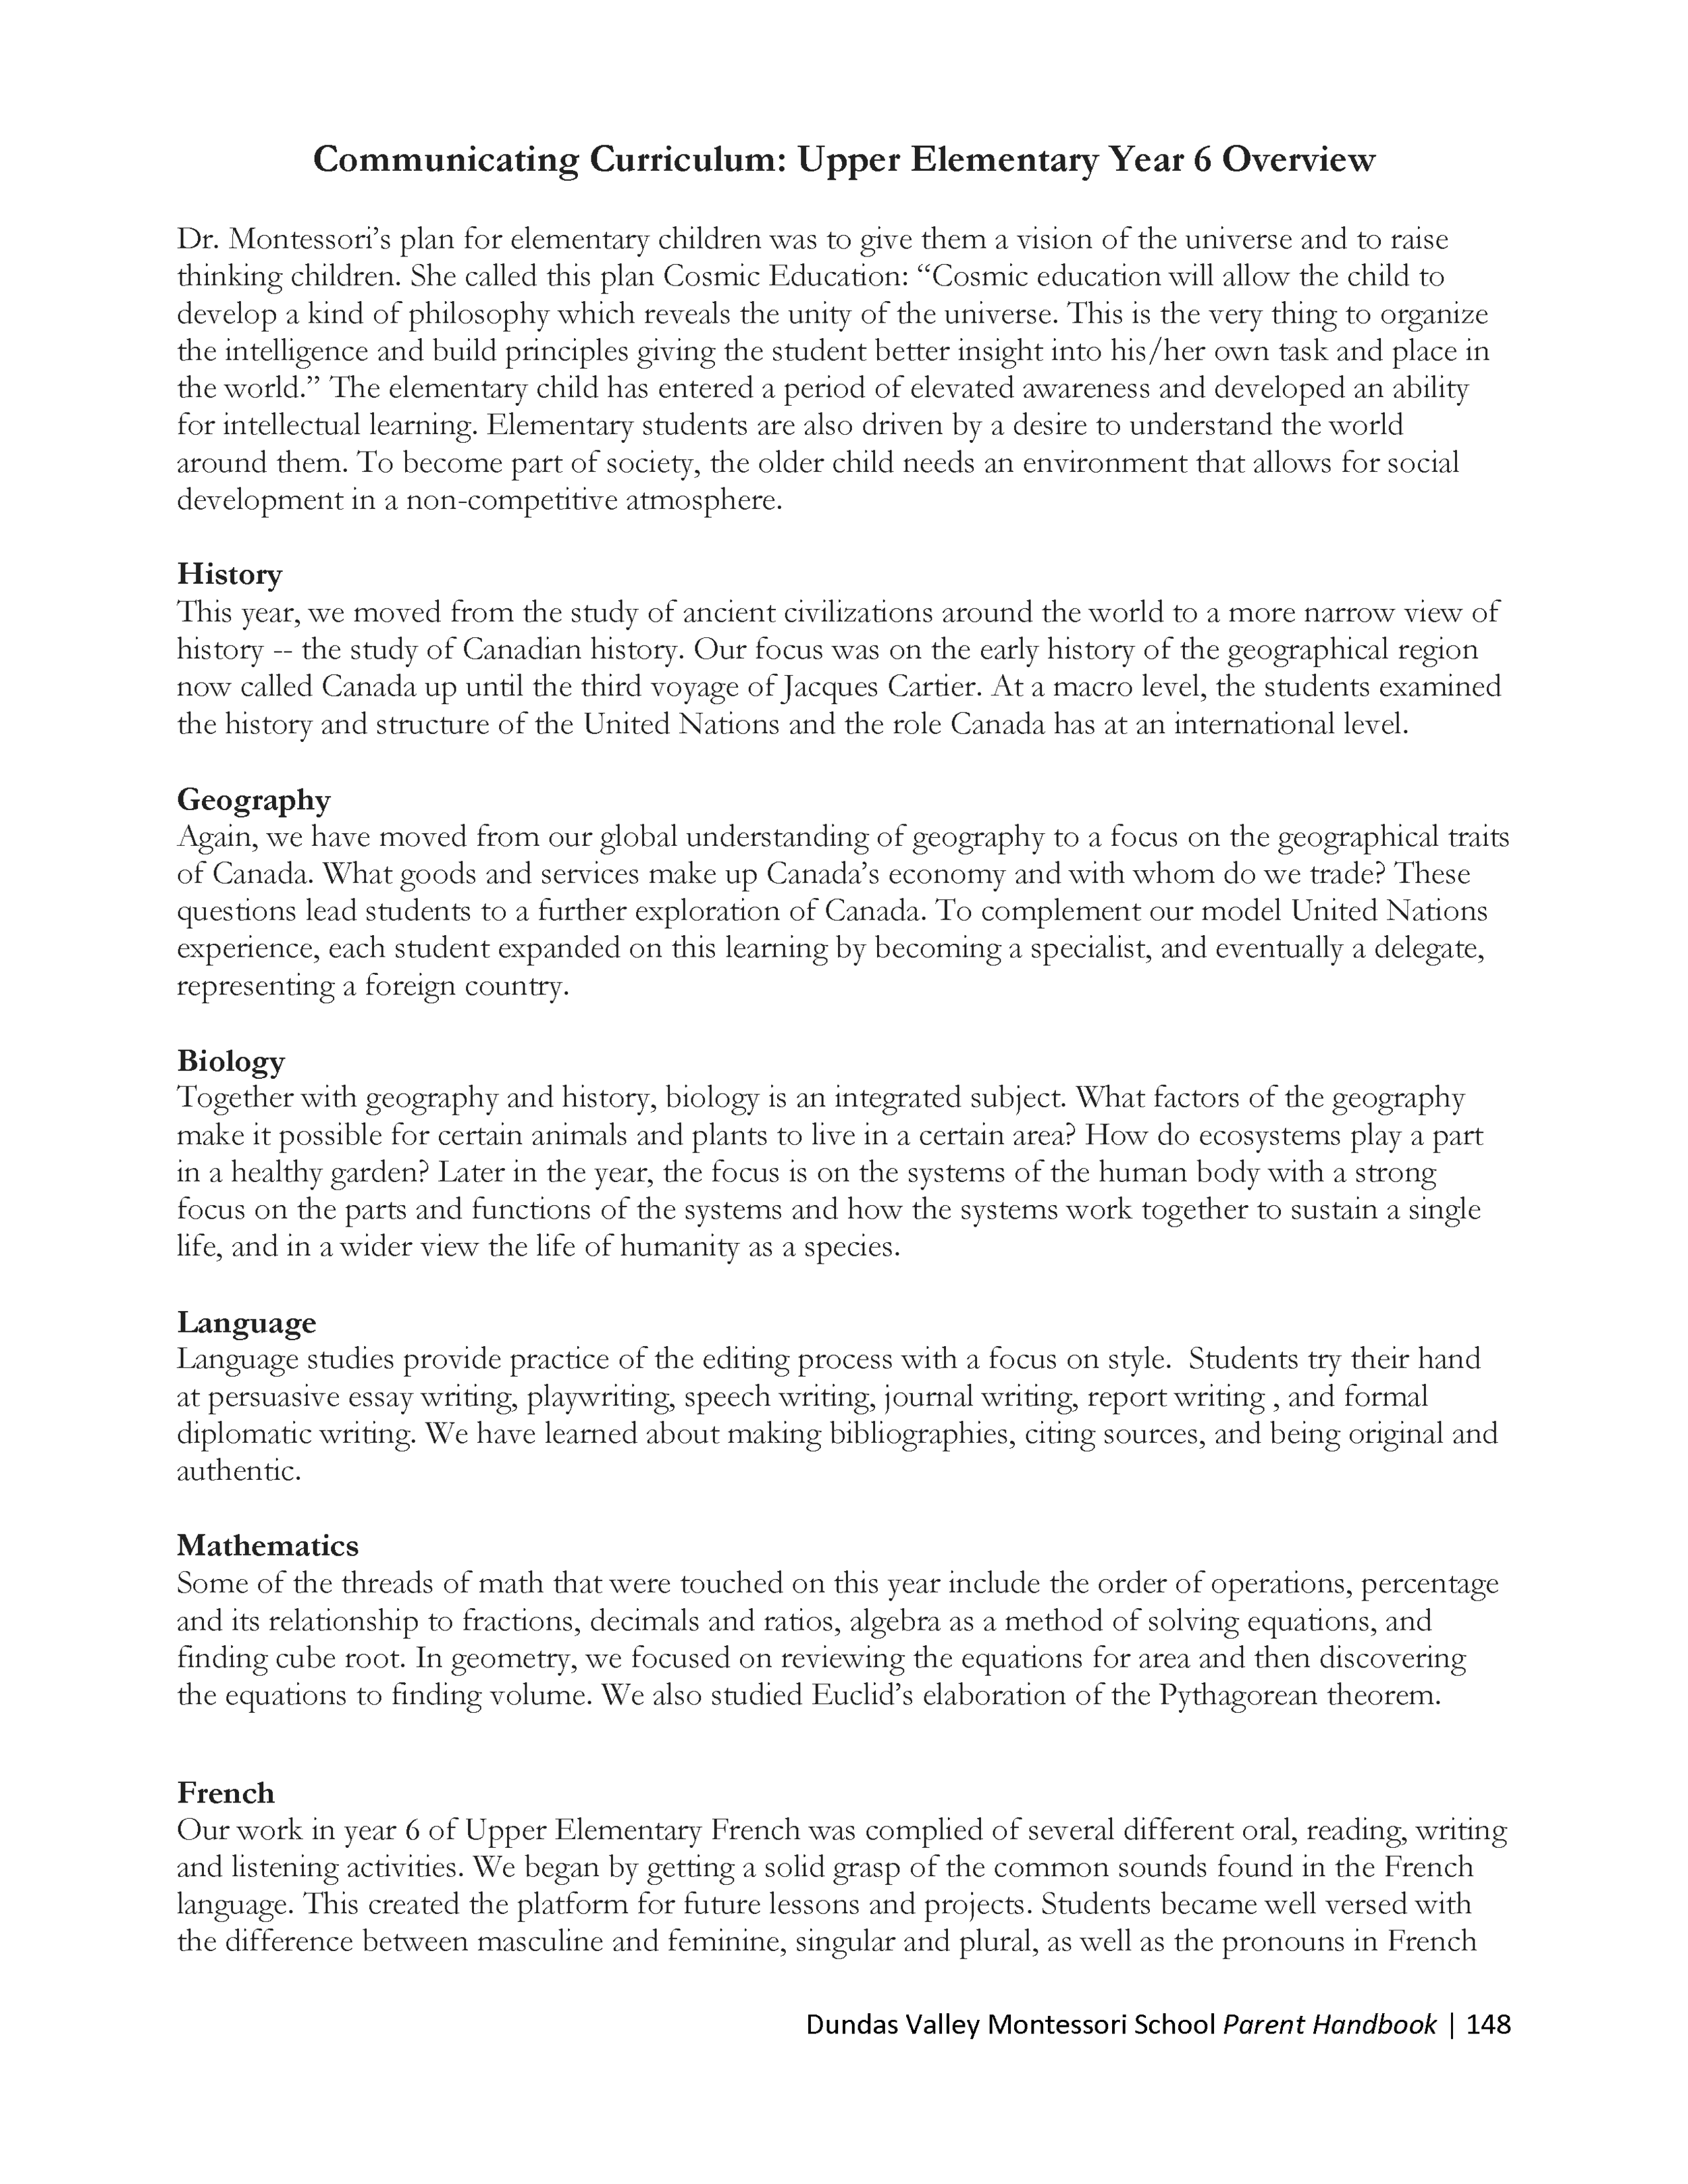 DVMS-Parent-Handbook-19-20_Page_150.png